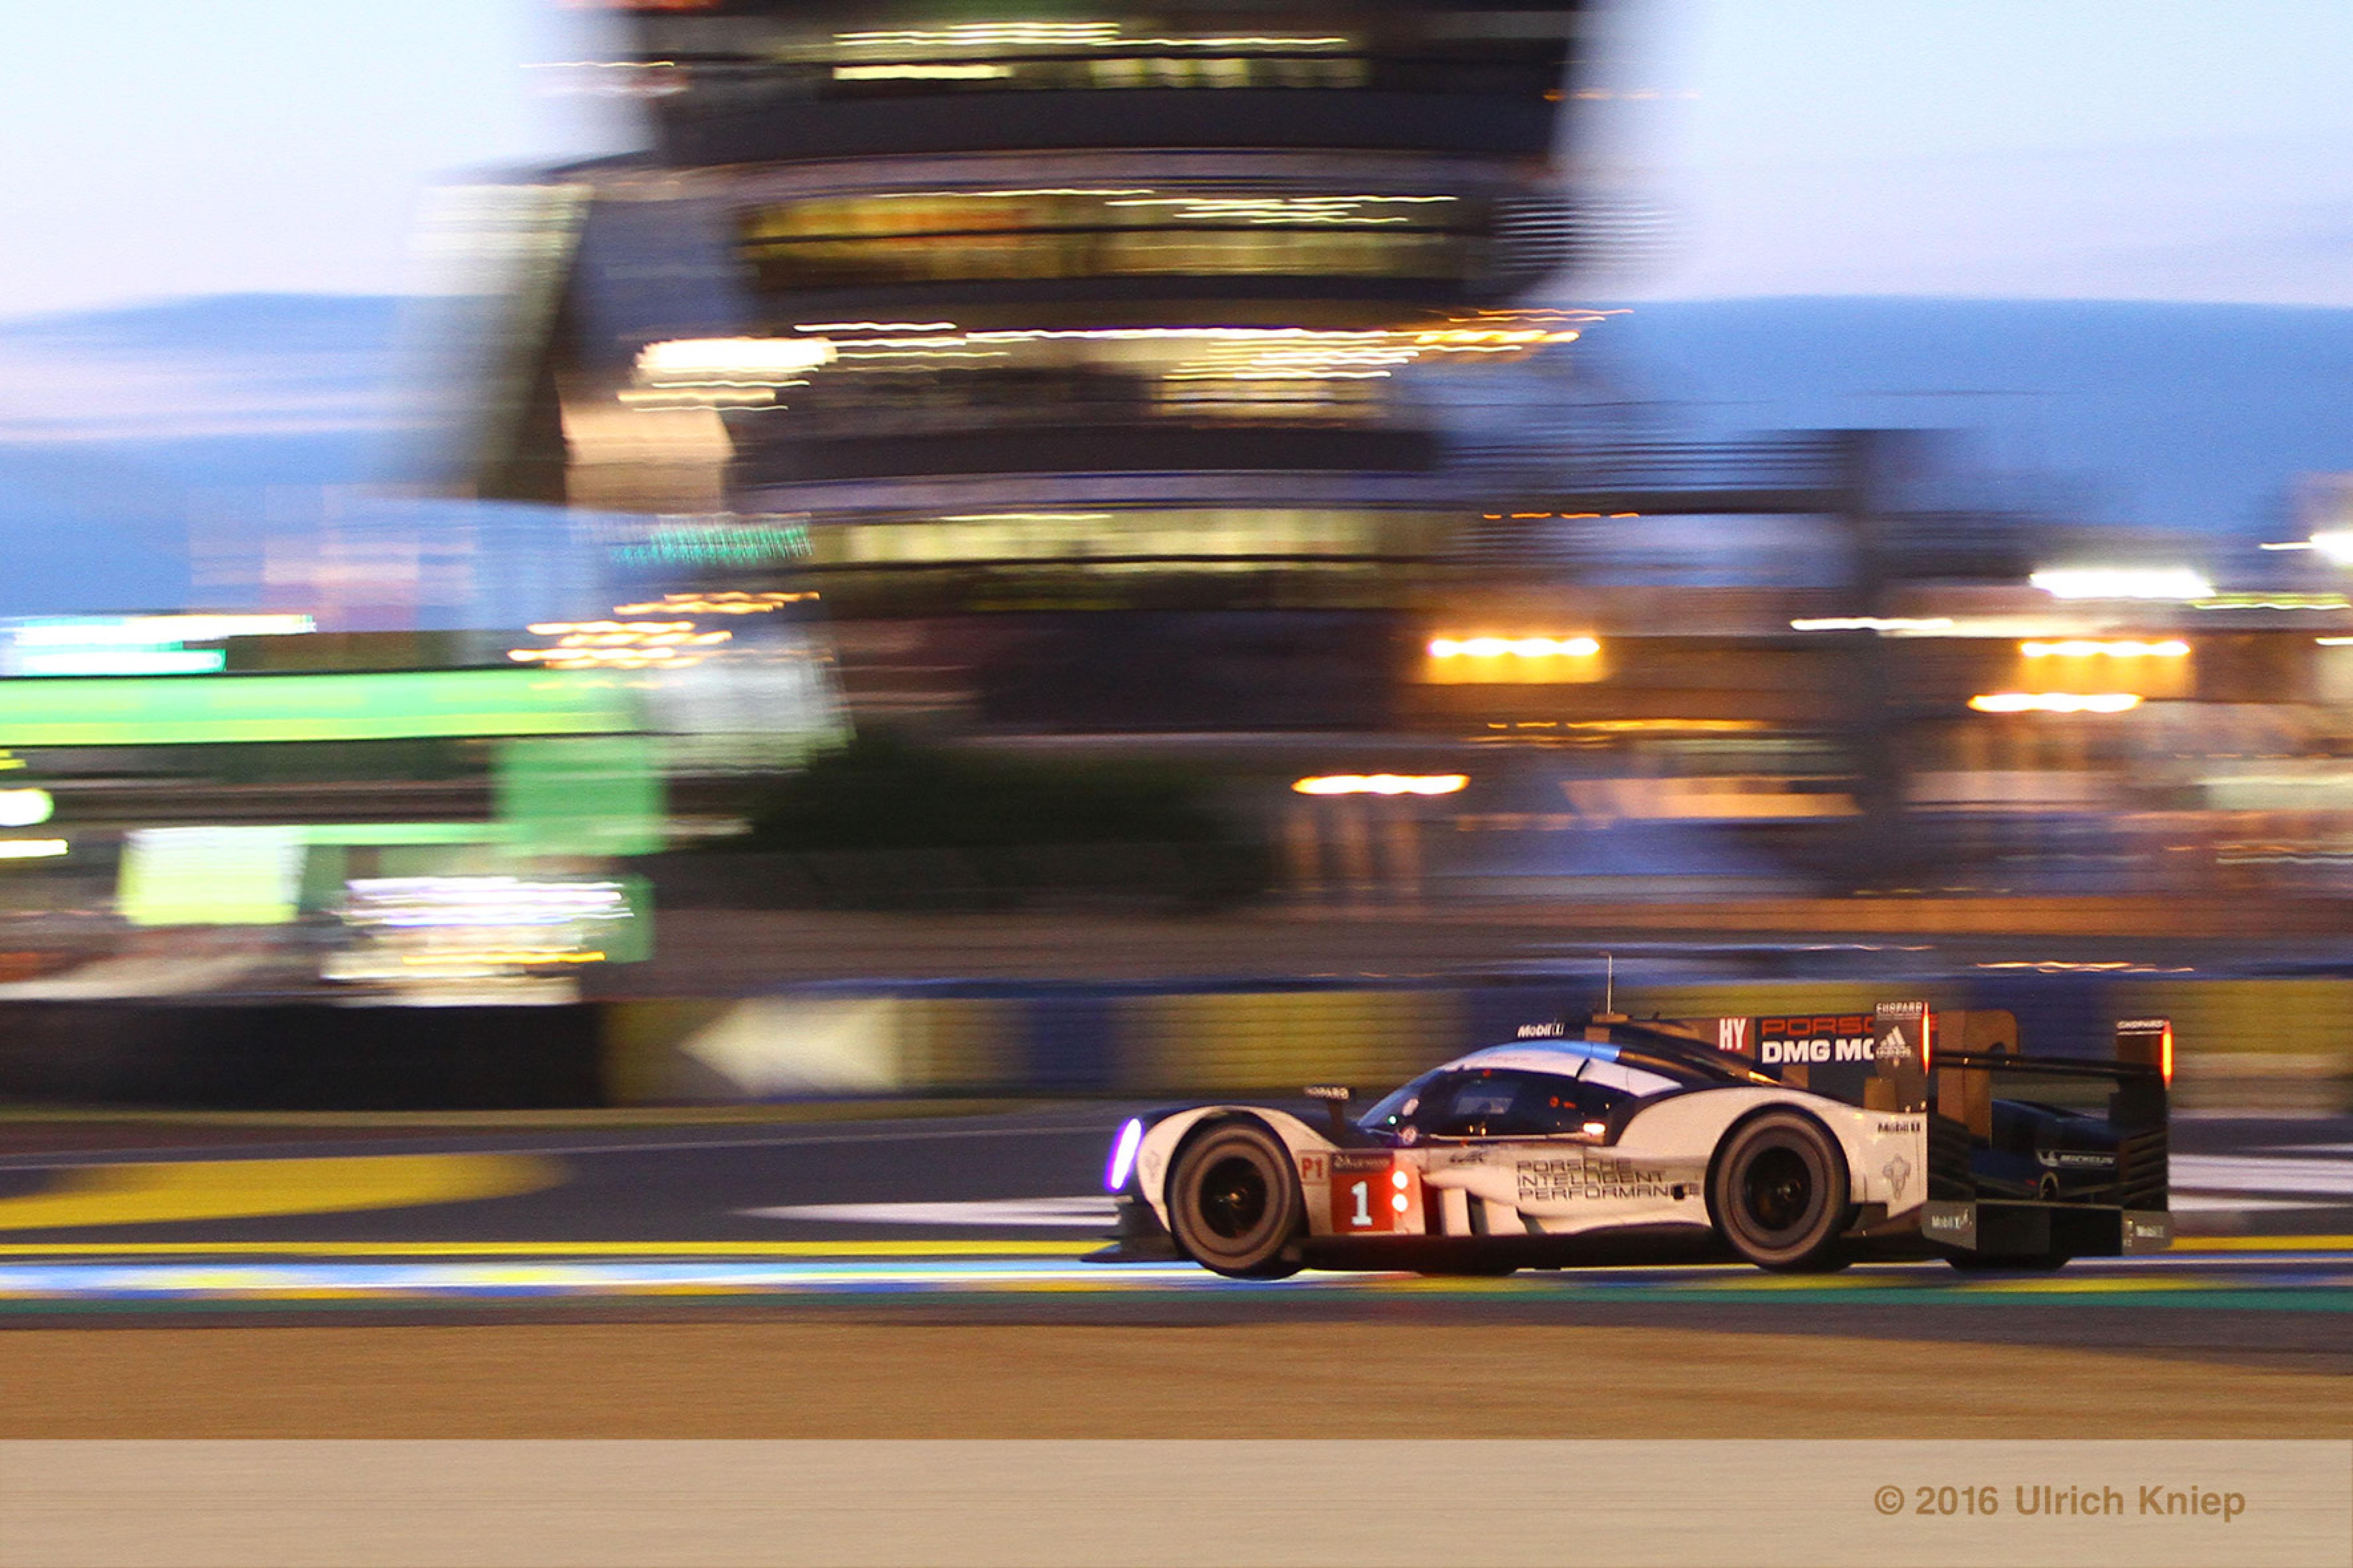 LMP1 Porsche evening